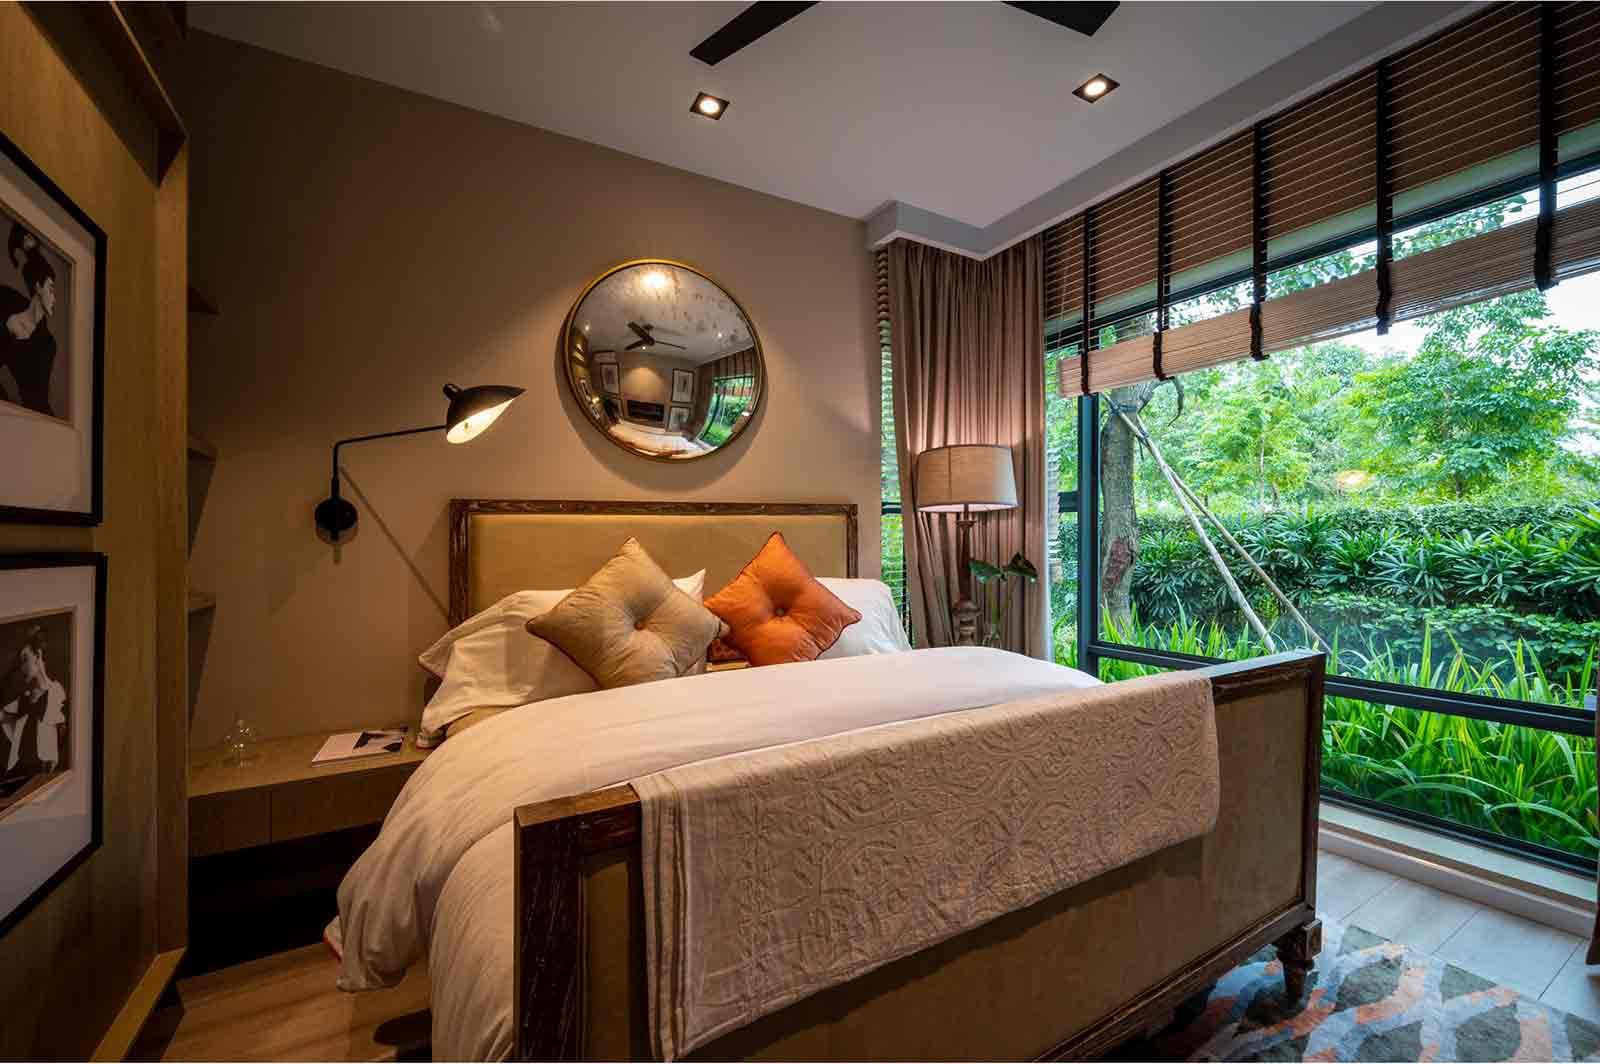 Kamar tidur dengan tone warna cokelat, foto oleh Huy Nguyen, via unsplash.com